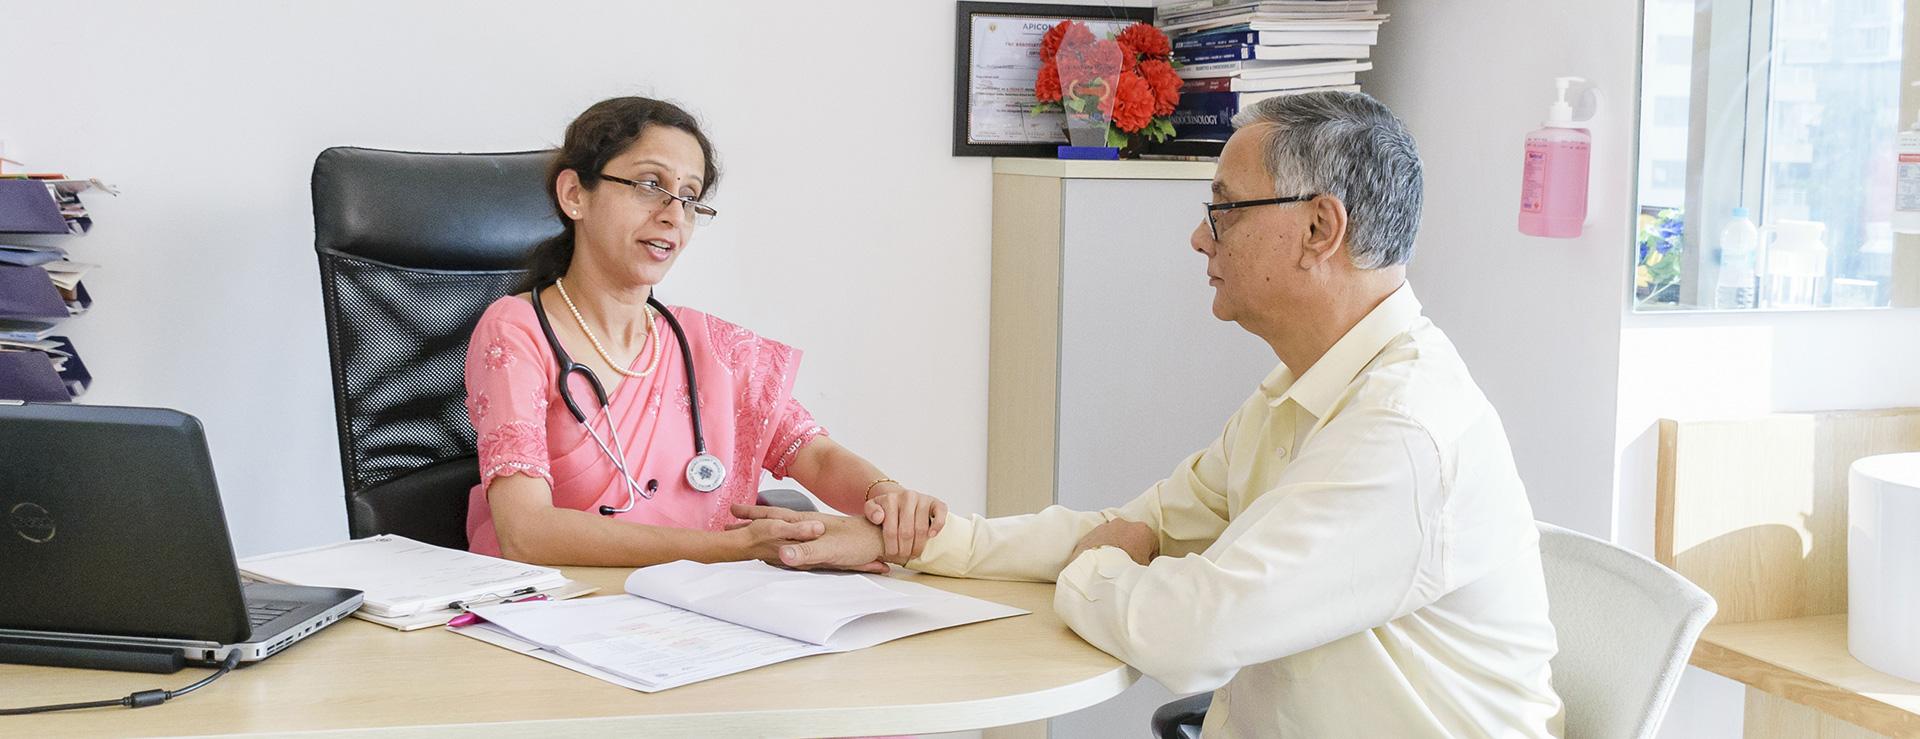 best-hospital-for-bariatric-surgery-in-mumbai